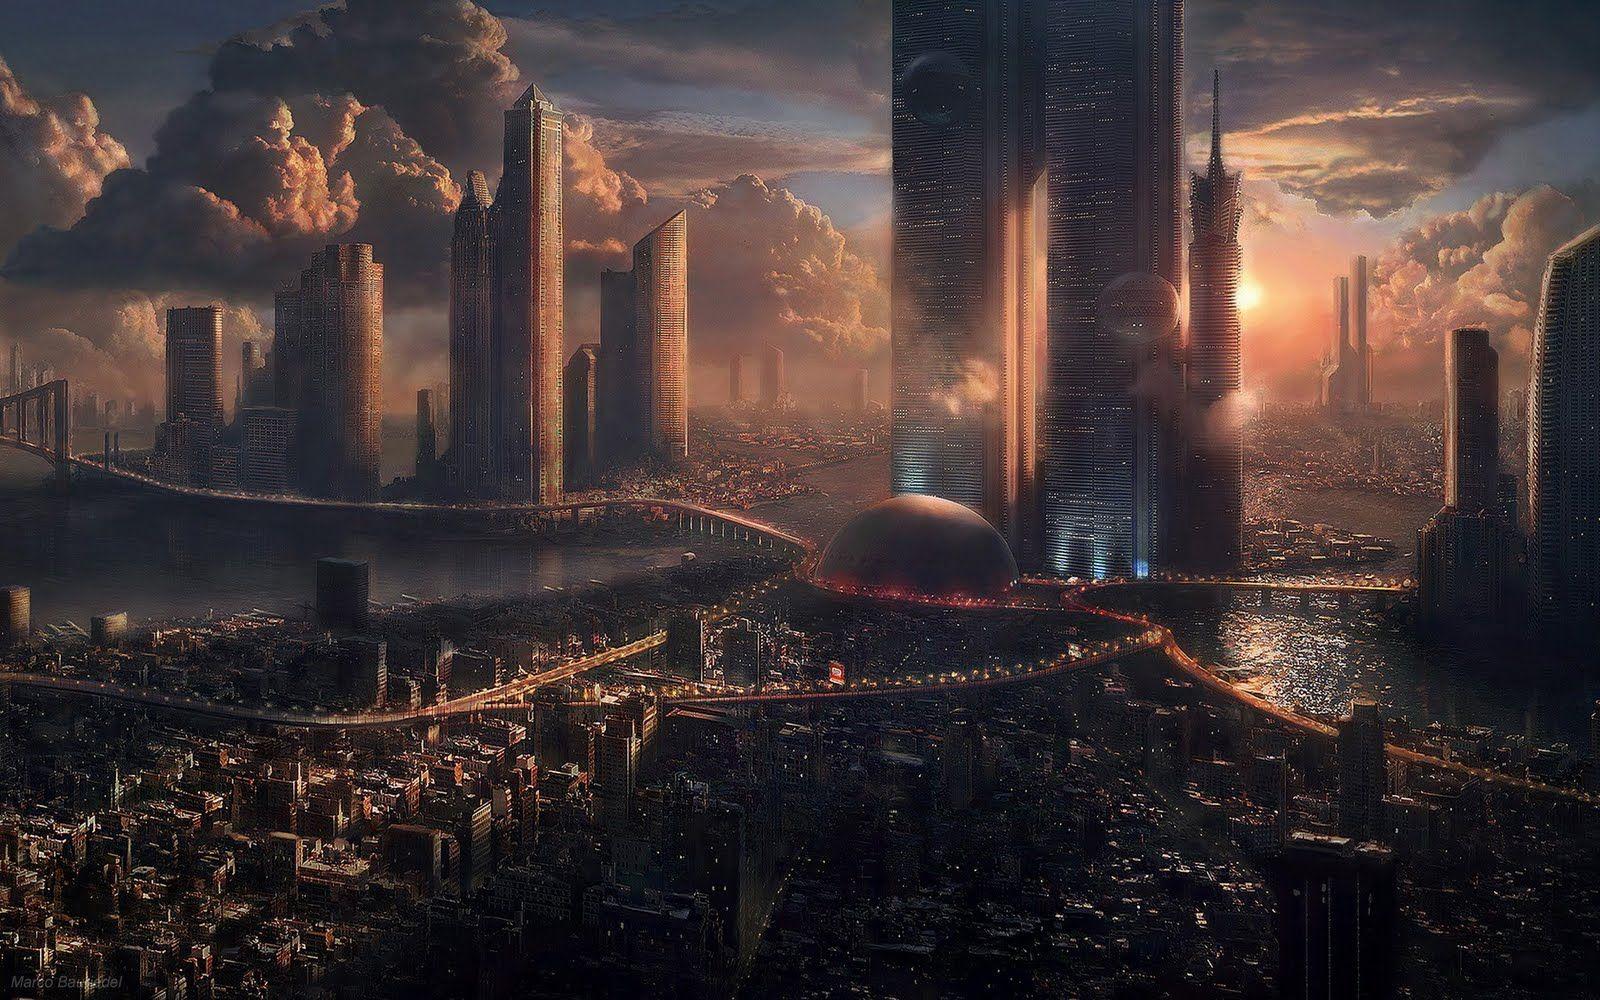 Artistic Wallpapers Desktop Wallpapers Fantasy Landscape Futuristic City Sci Fi City